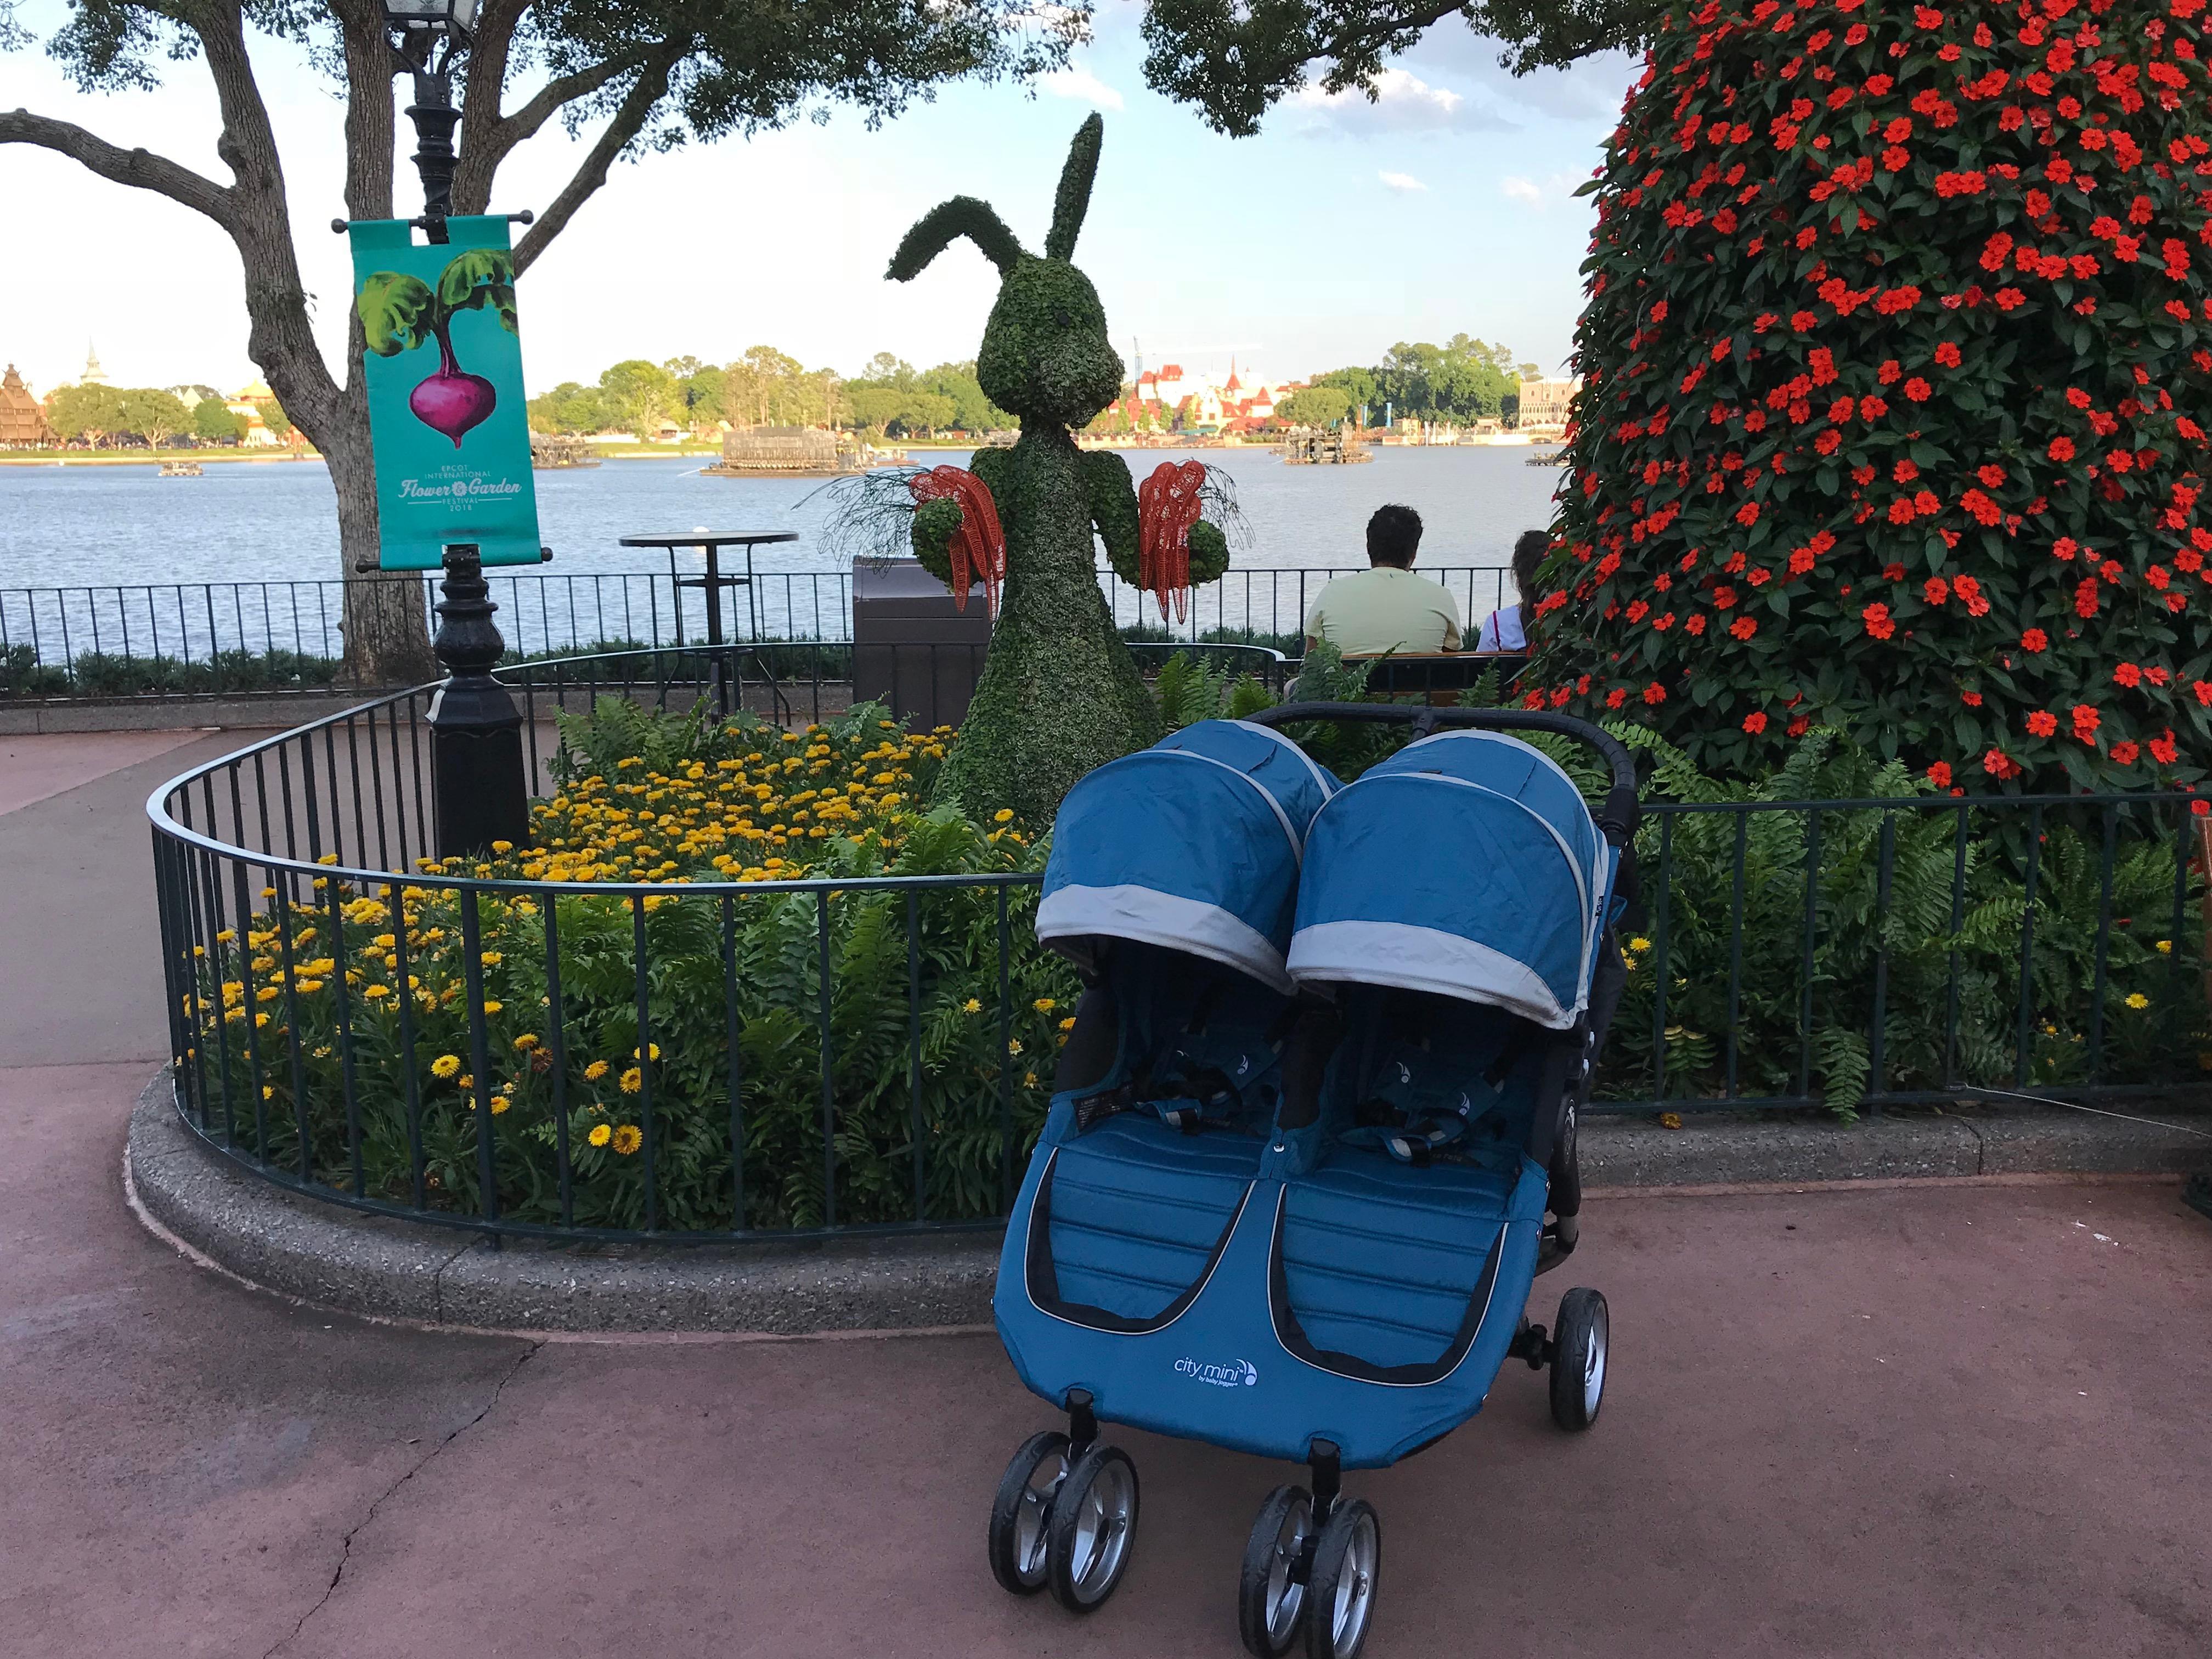 Stroller Rentals Disney image 46